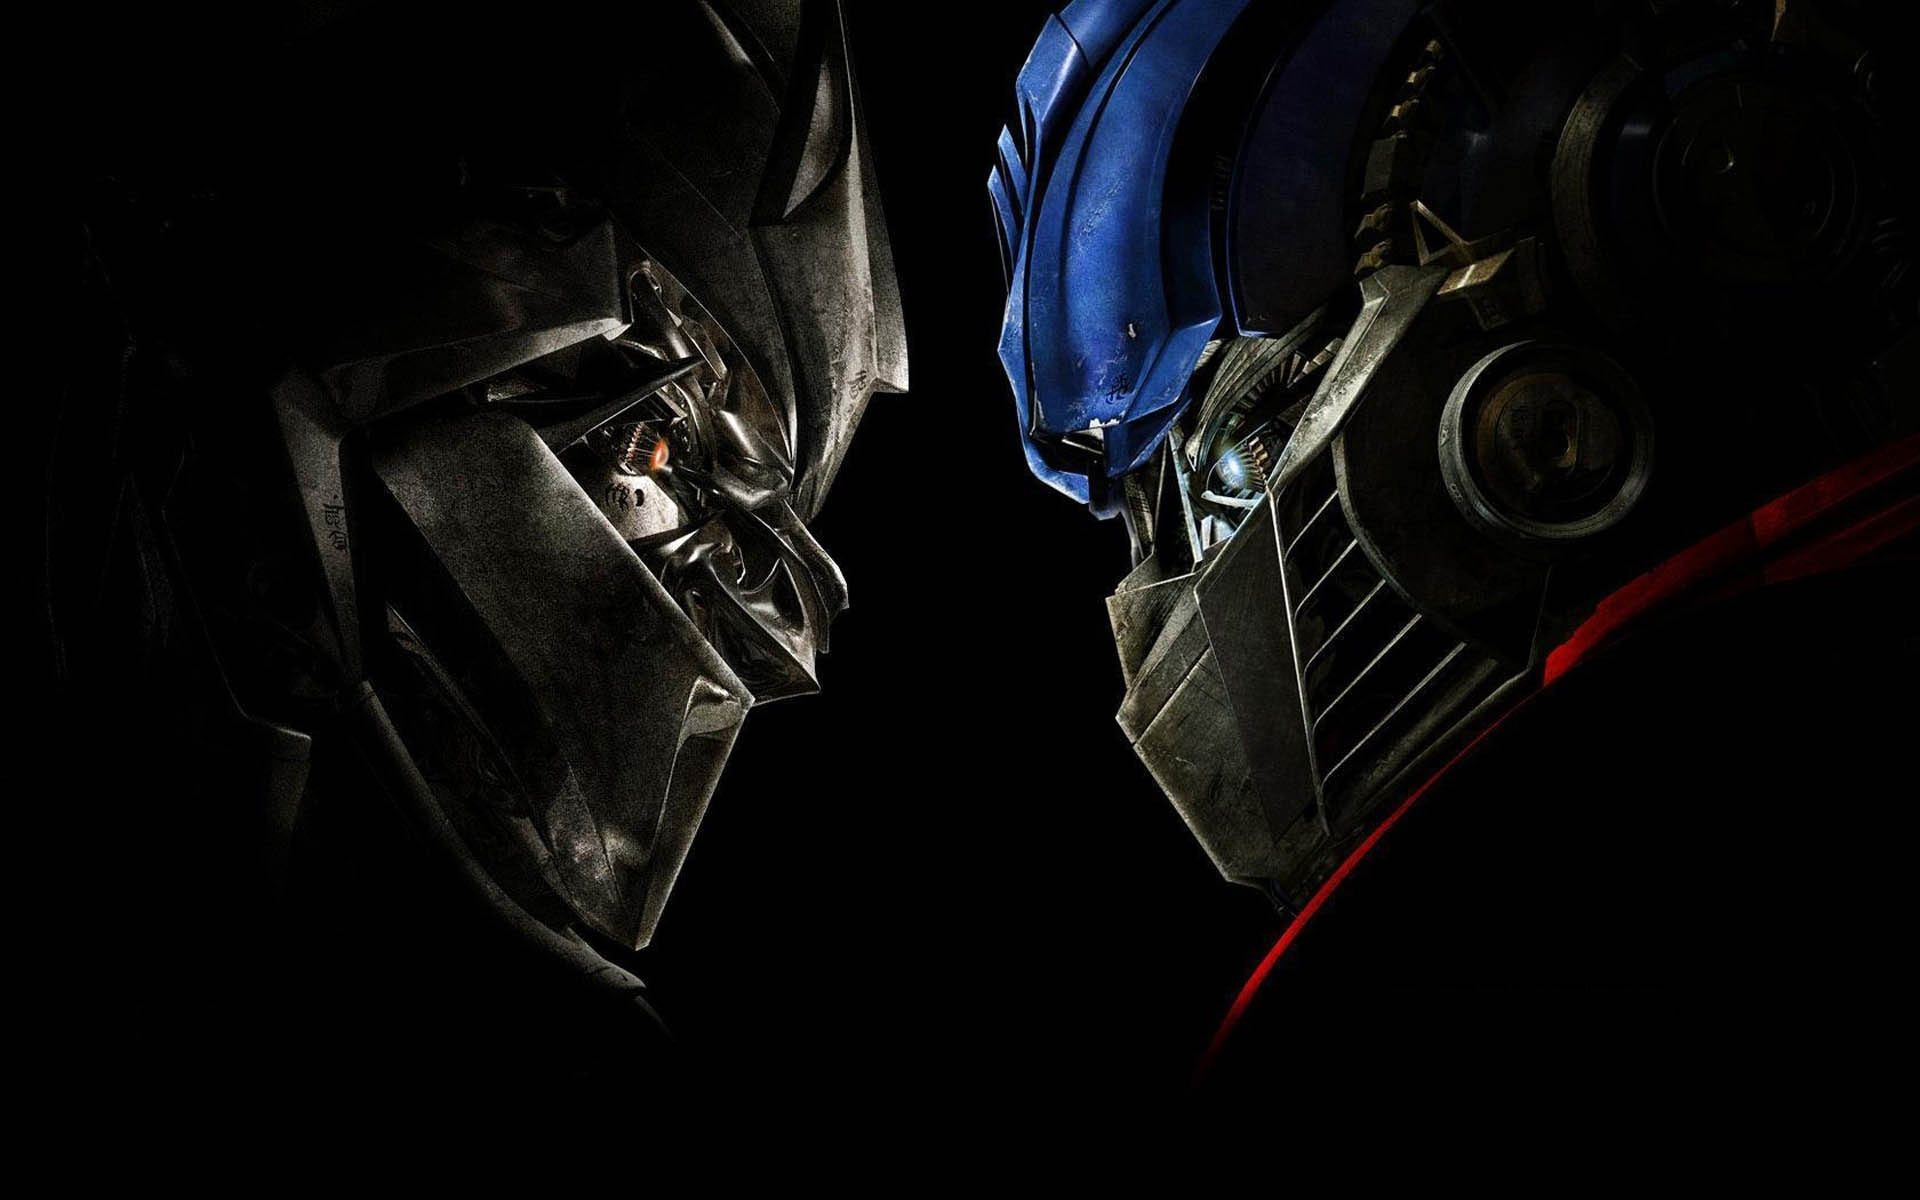 Desktopwallpaper S Com Transformers Optimus Prime Wallpaper Transformers Optimus